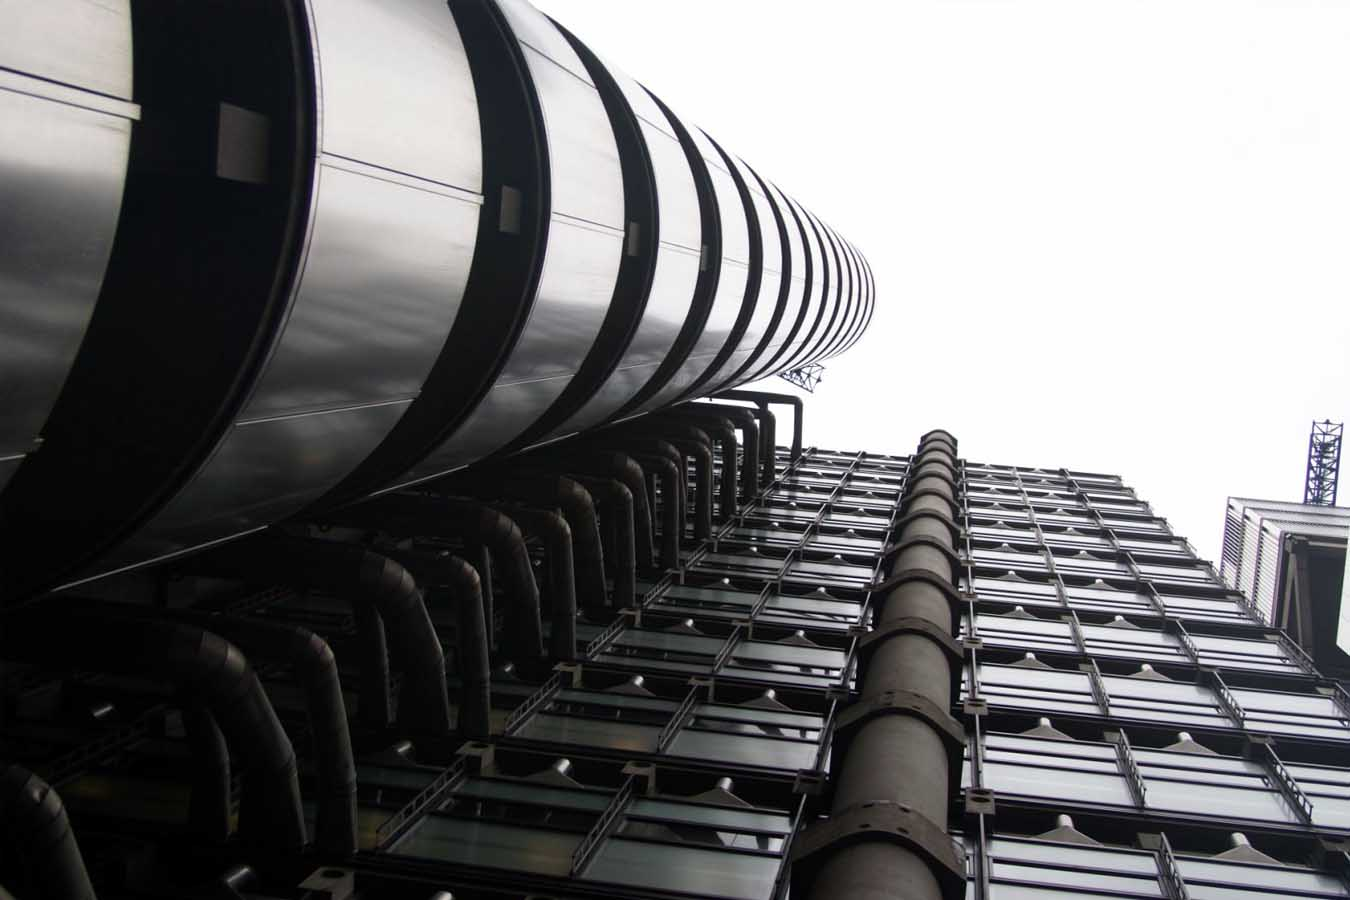 Lloyds Building, London, UK